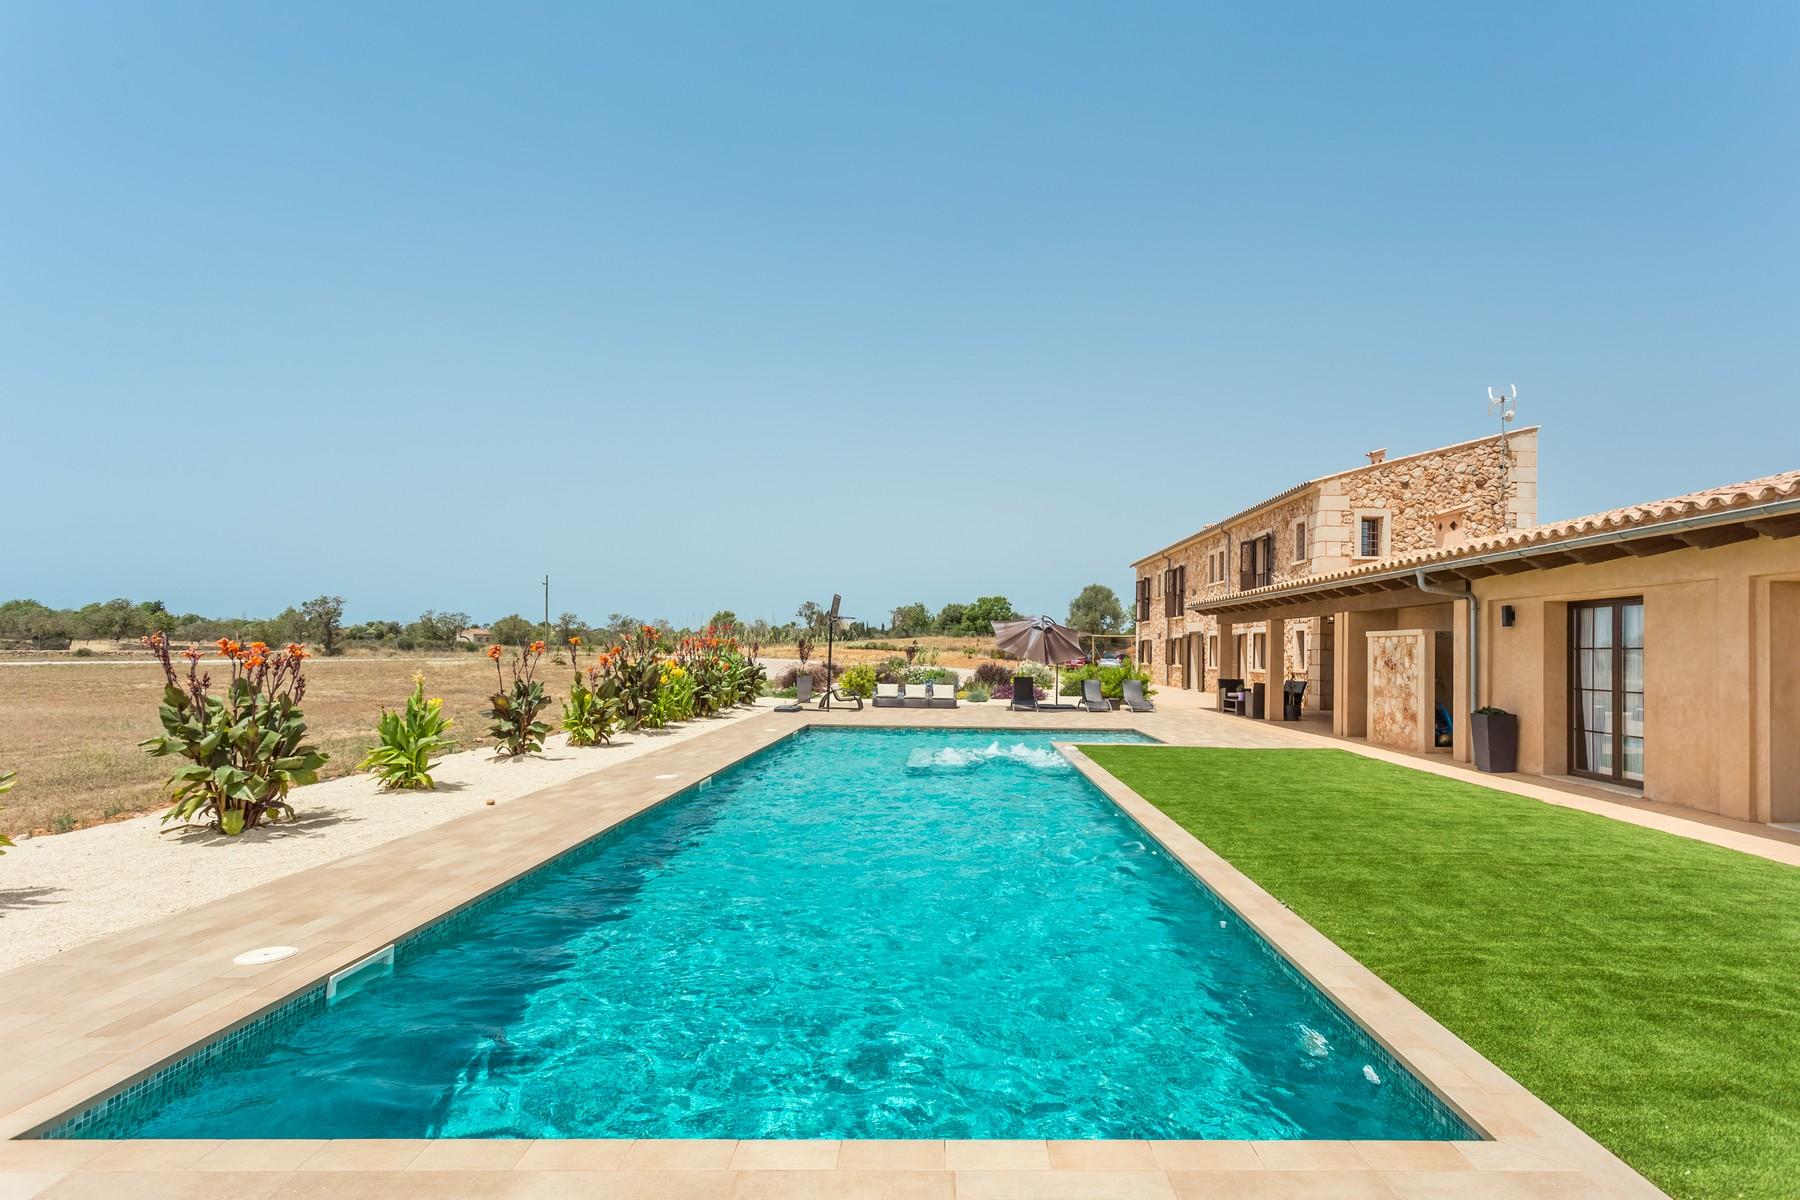 Частный односемейный дом для того Продажа на Country Estate with panoramic views in Llucmajor Other Balearic Islands, Balearic Islands, 07000 Испания